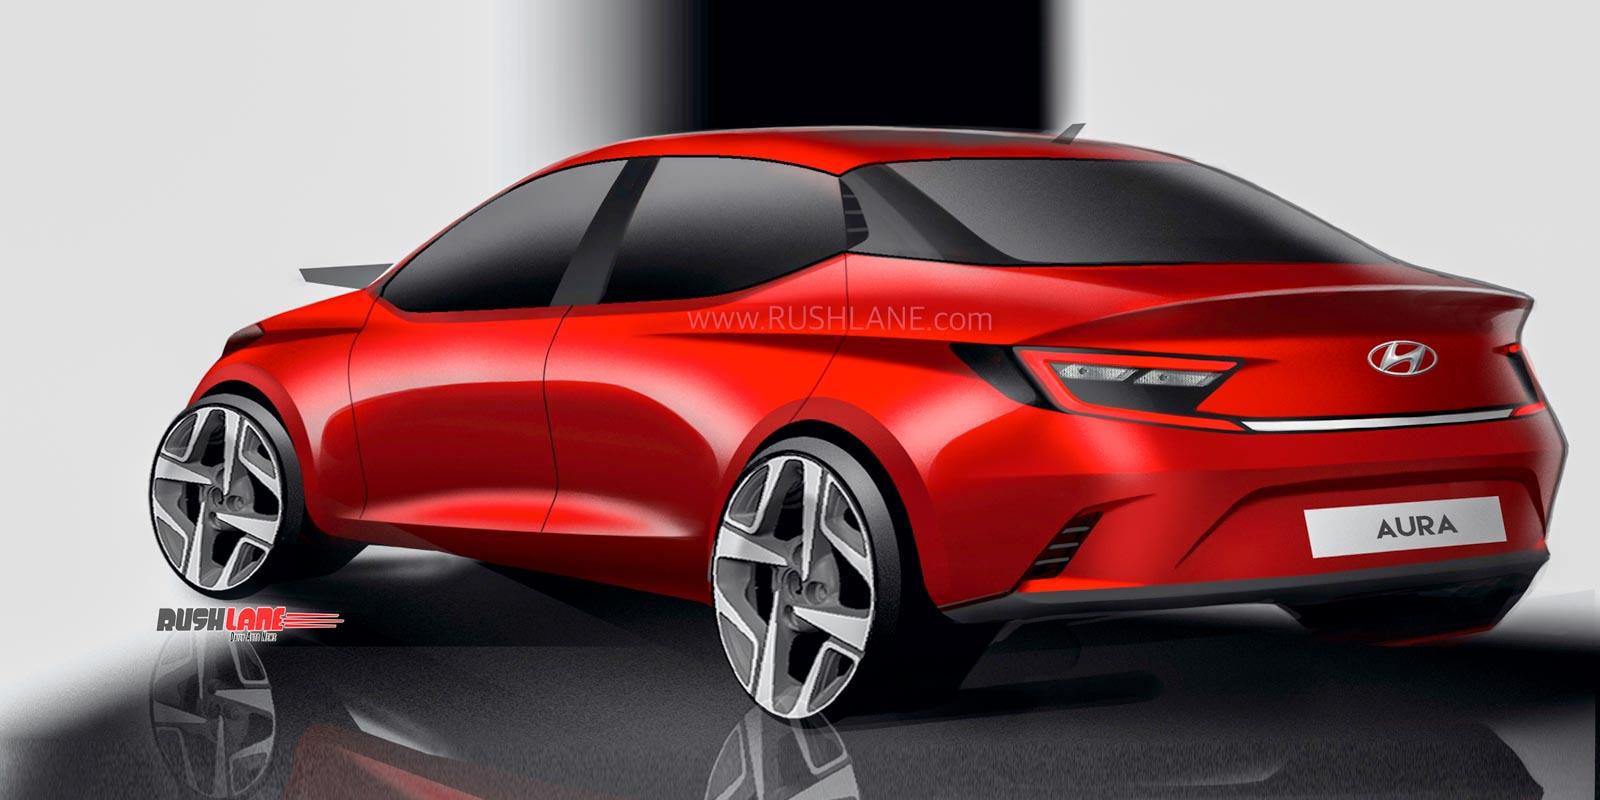 Hyundai Auro render